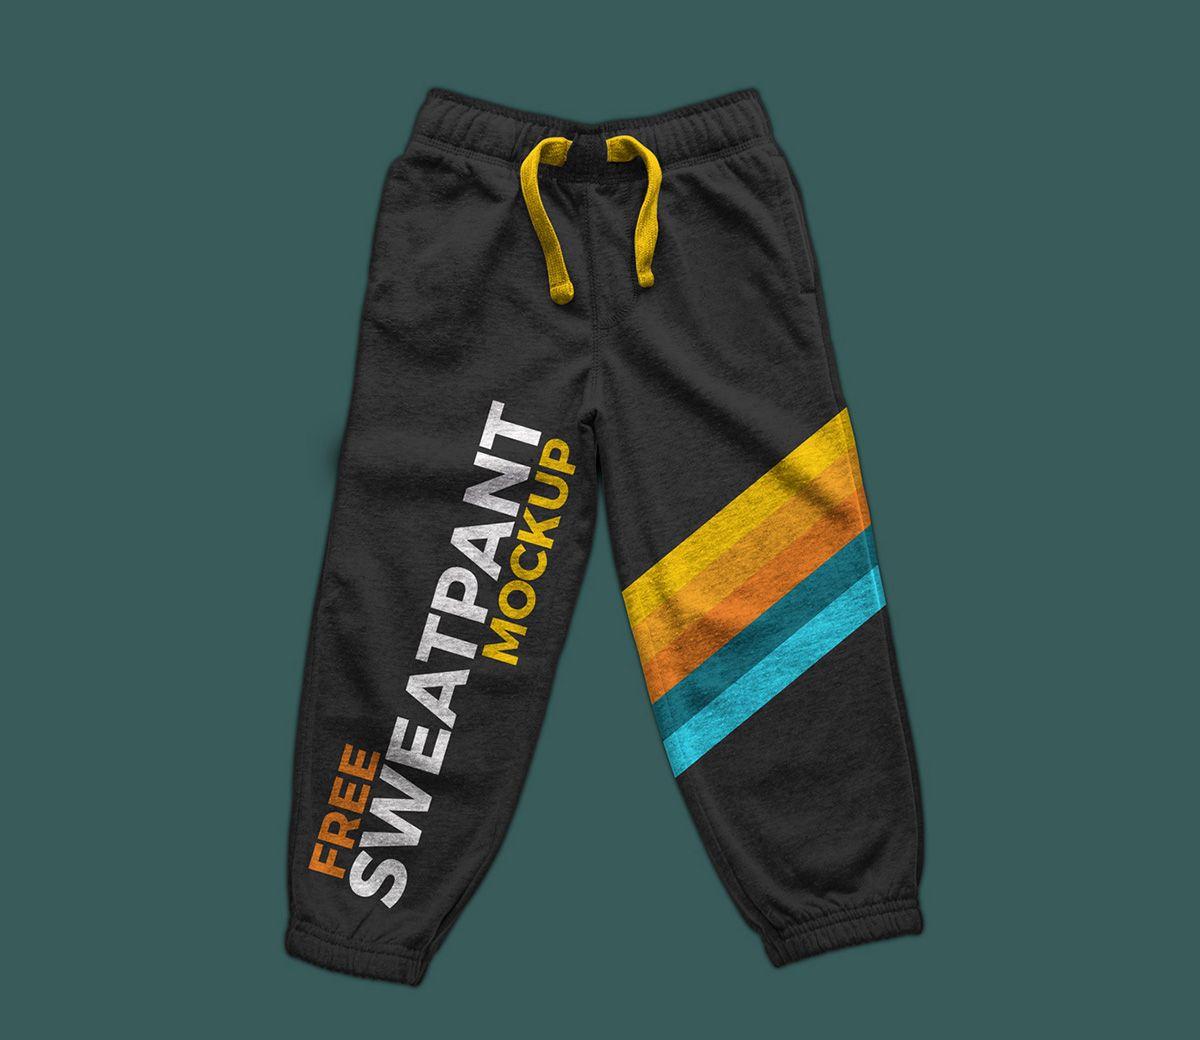 Download Free Sweatpants Mockup Apemockups Clothing Mockup Sweatpants Mockup Free Psd